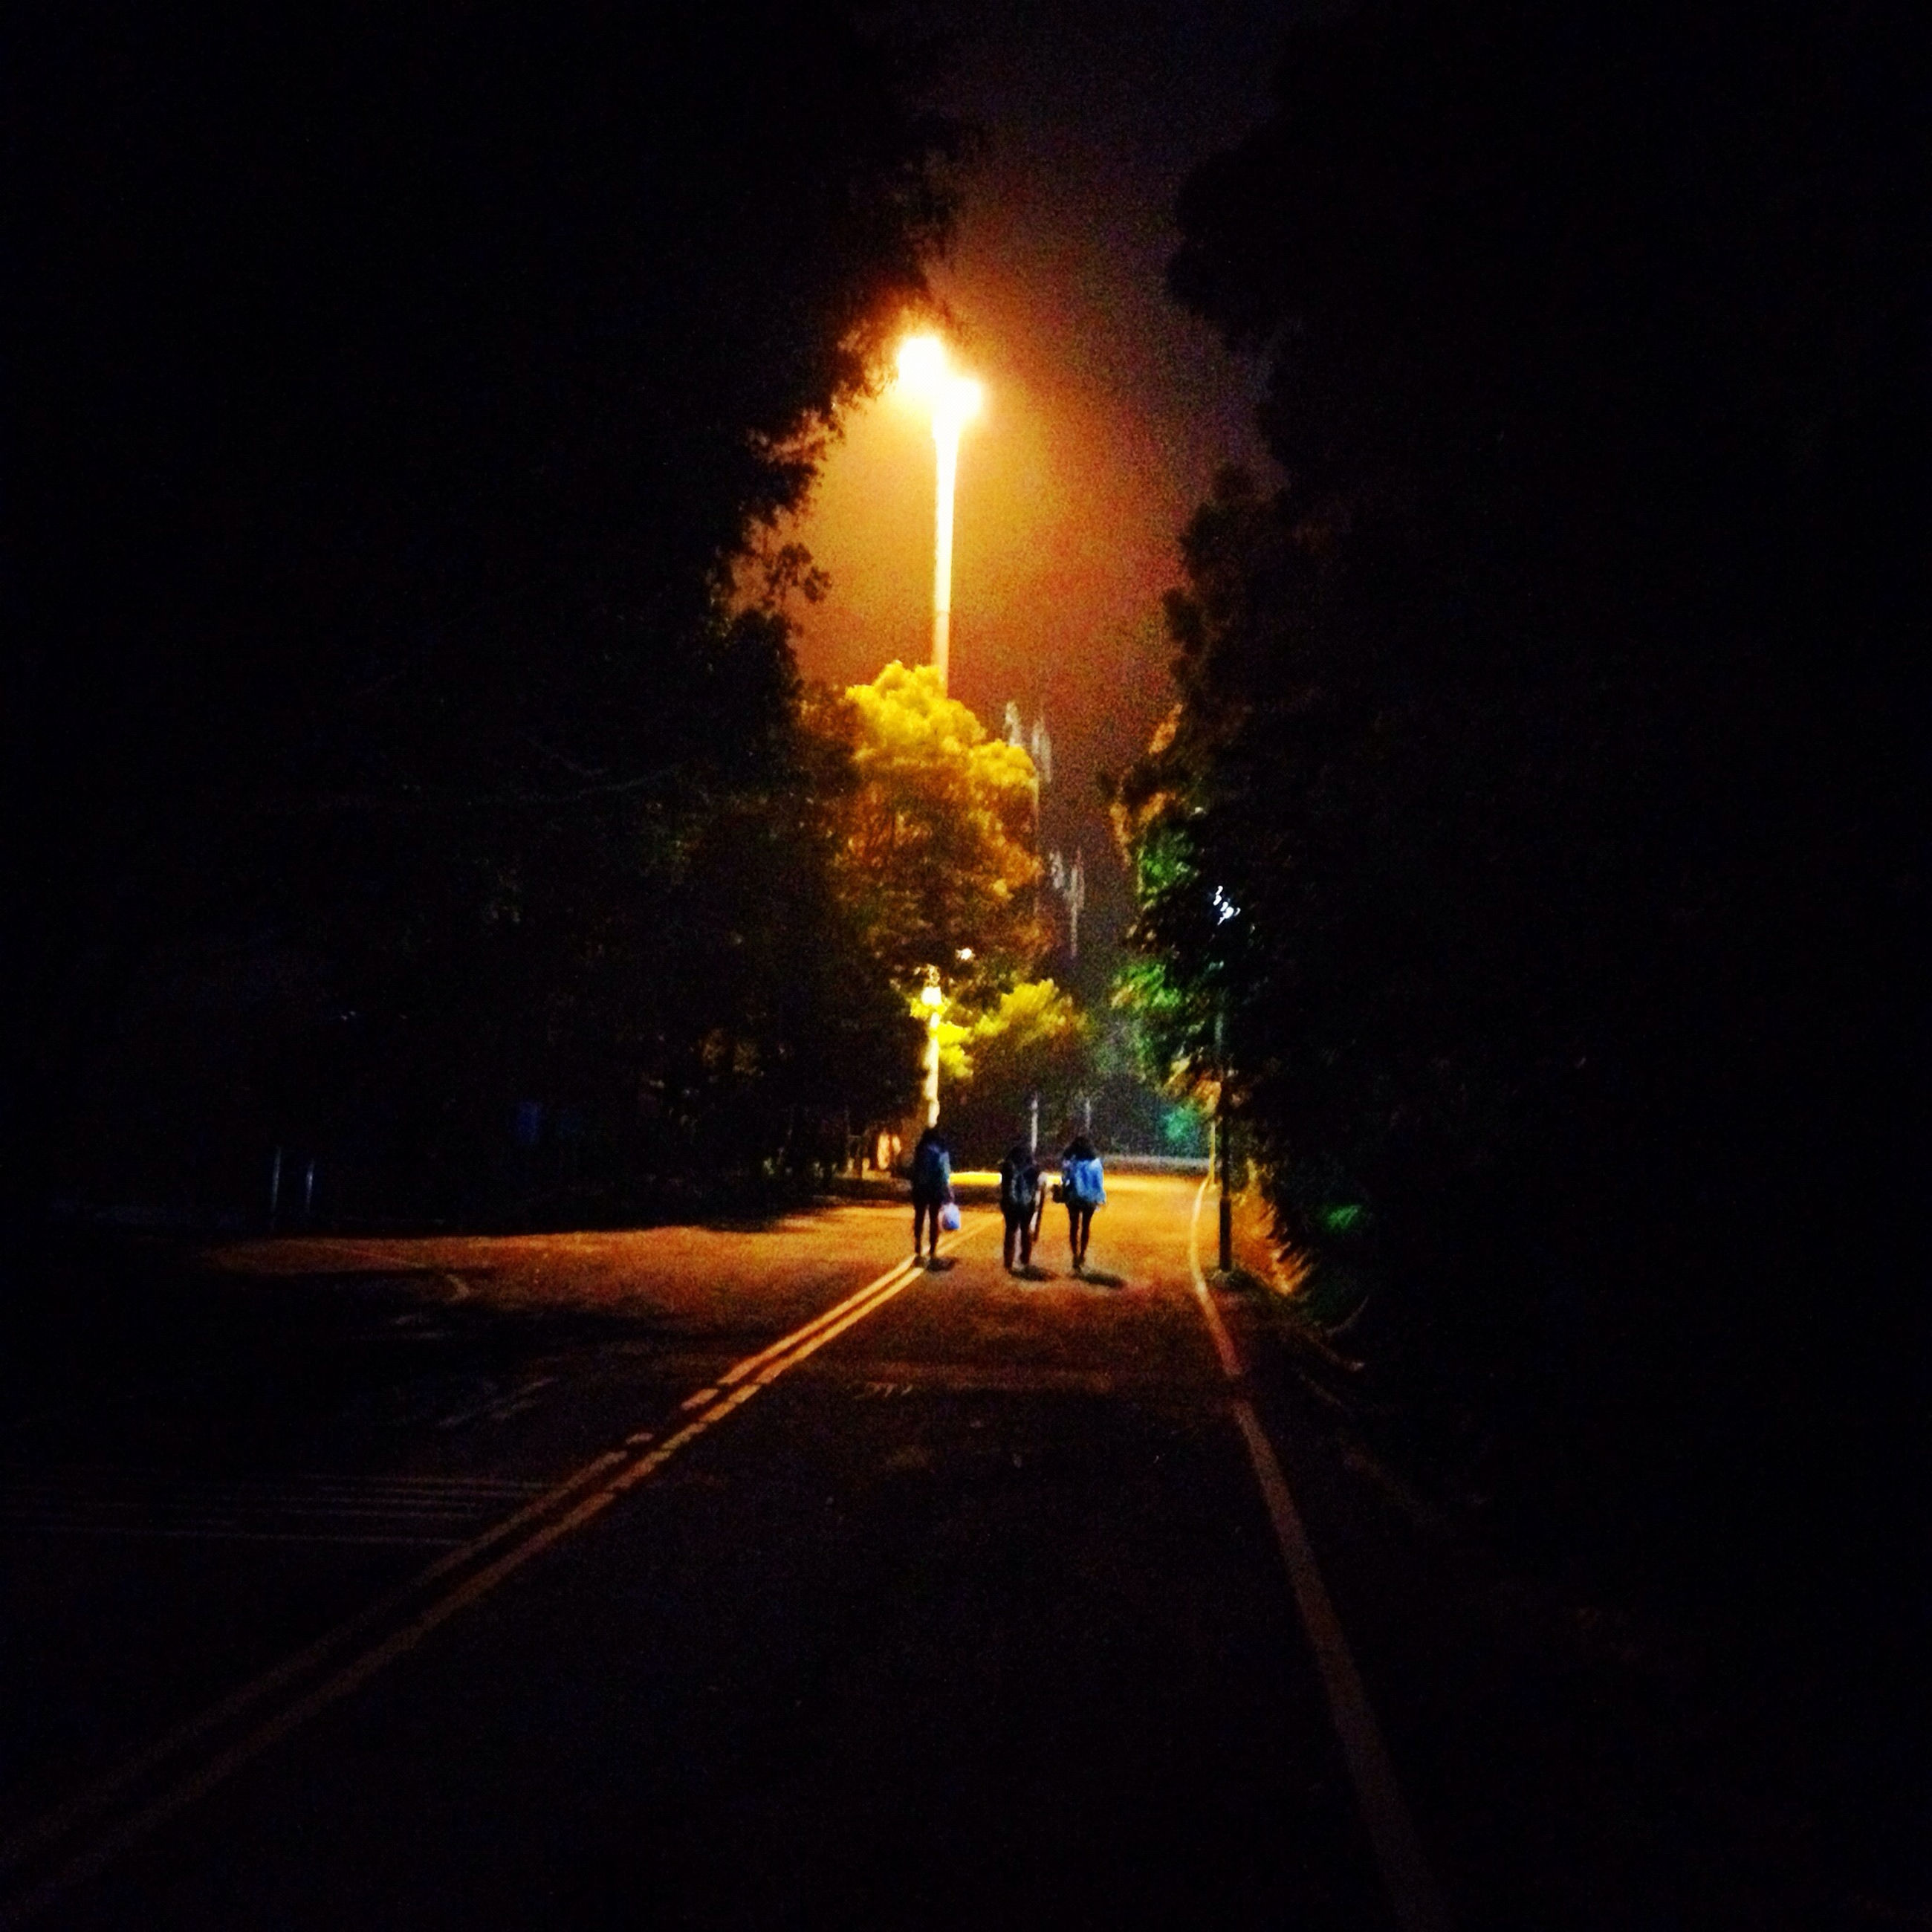 tree, the way forward, street light, illuminated, walking, silhouette, night, men, road, lighting equipment, street, lifestyles, diminishing perspective, sky, leisure activity, rear view, transportation, nature, full length